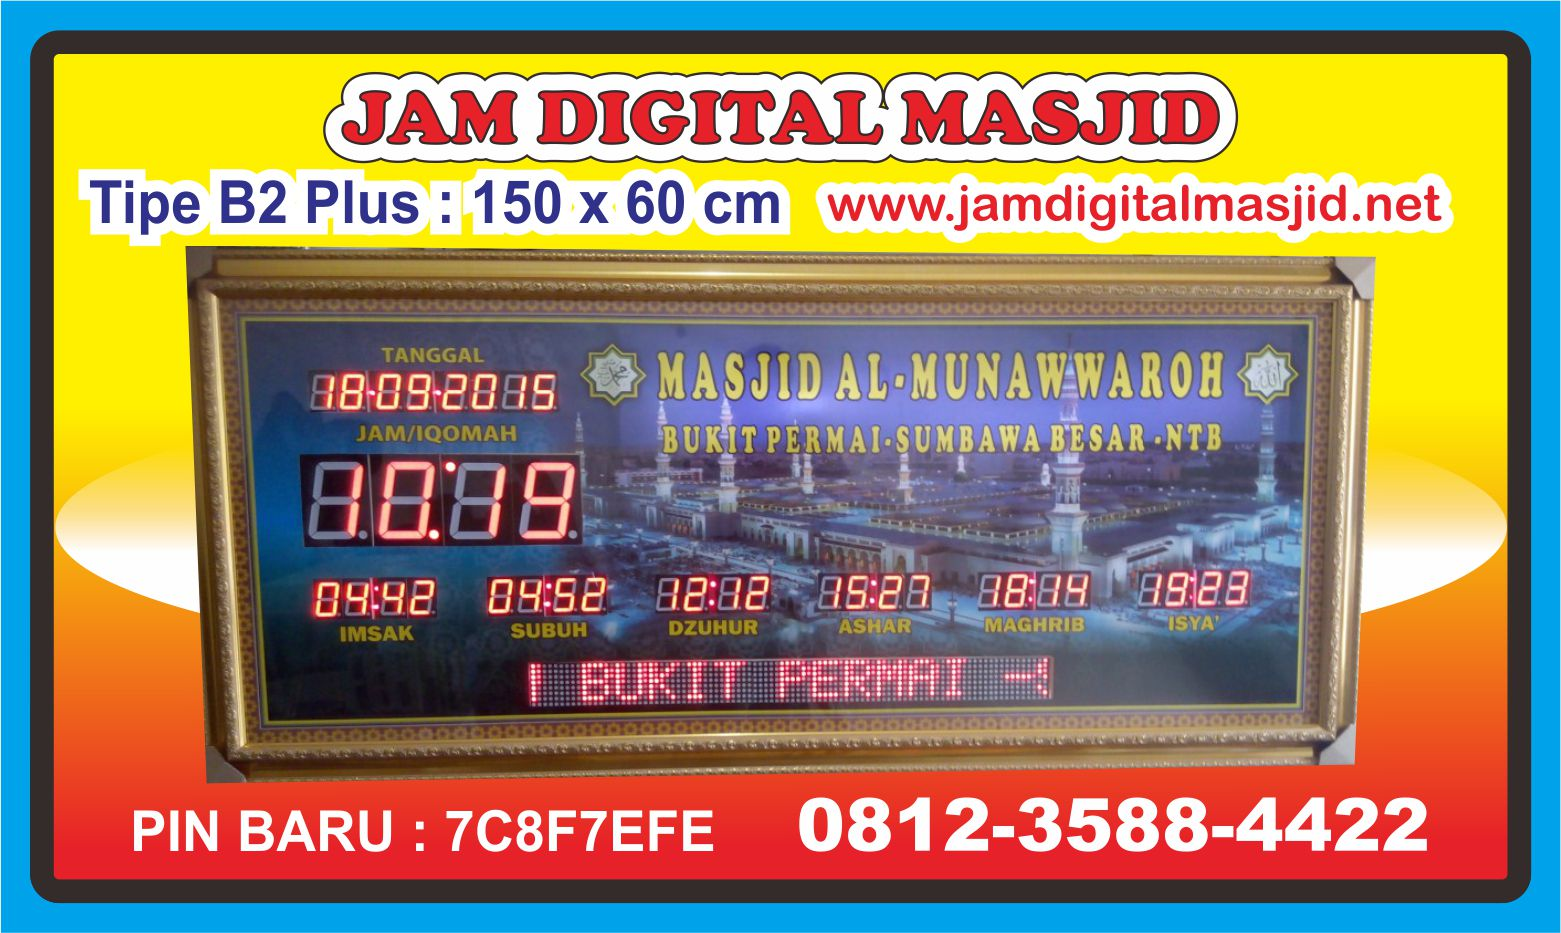 jam-digital-masjid-garansi-jual-ntb